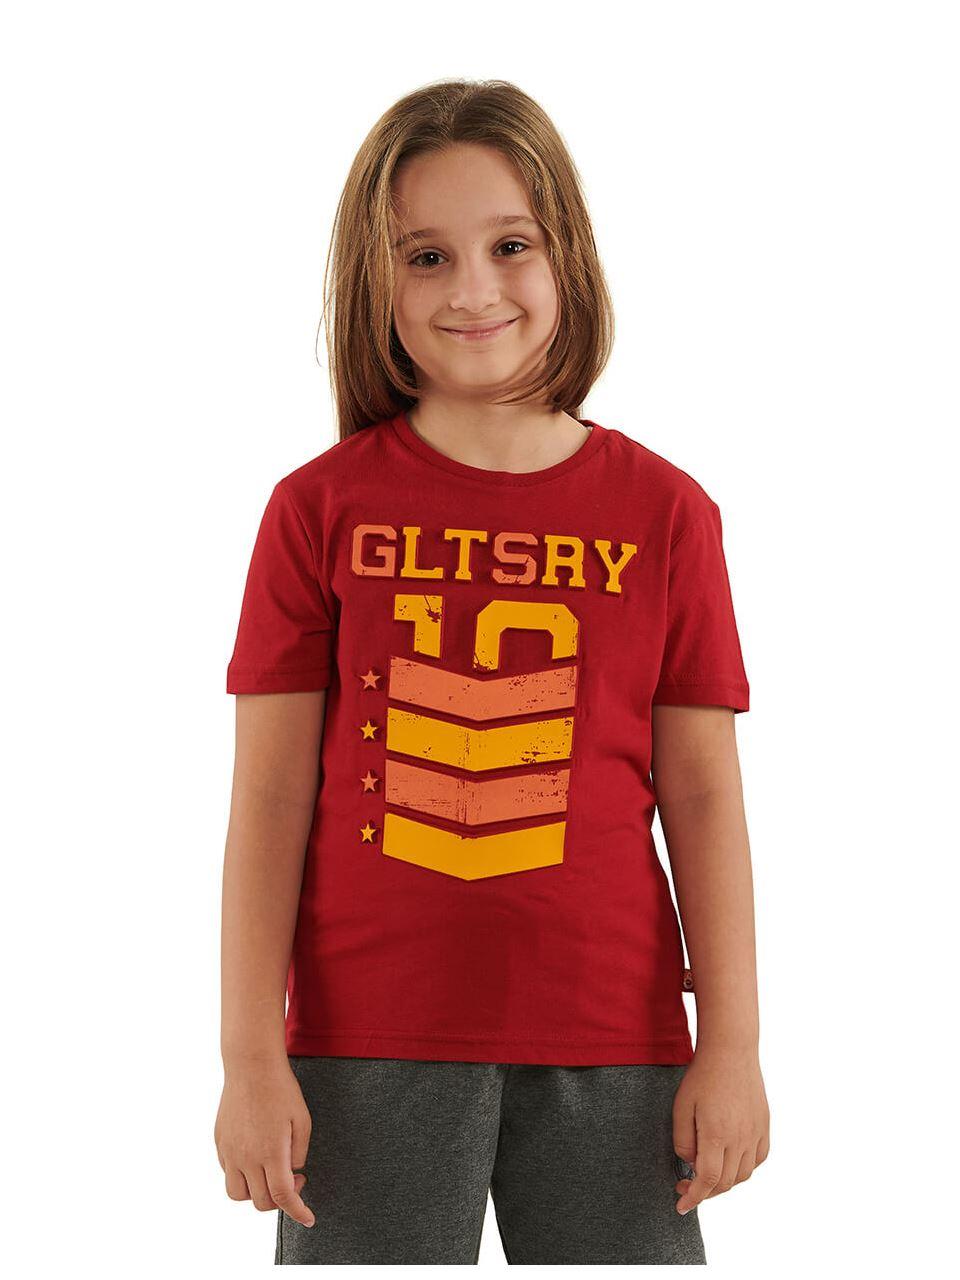 GLTSRY 10 ÇOCUK TSHIRT C191032